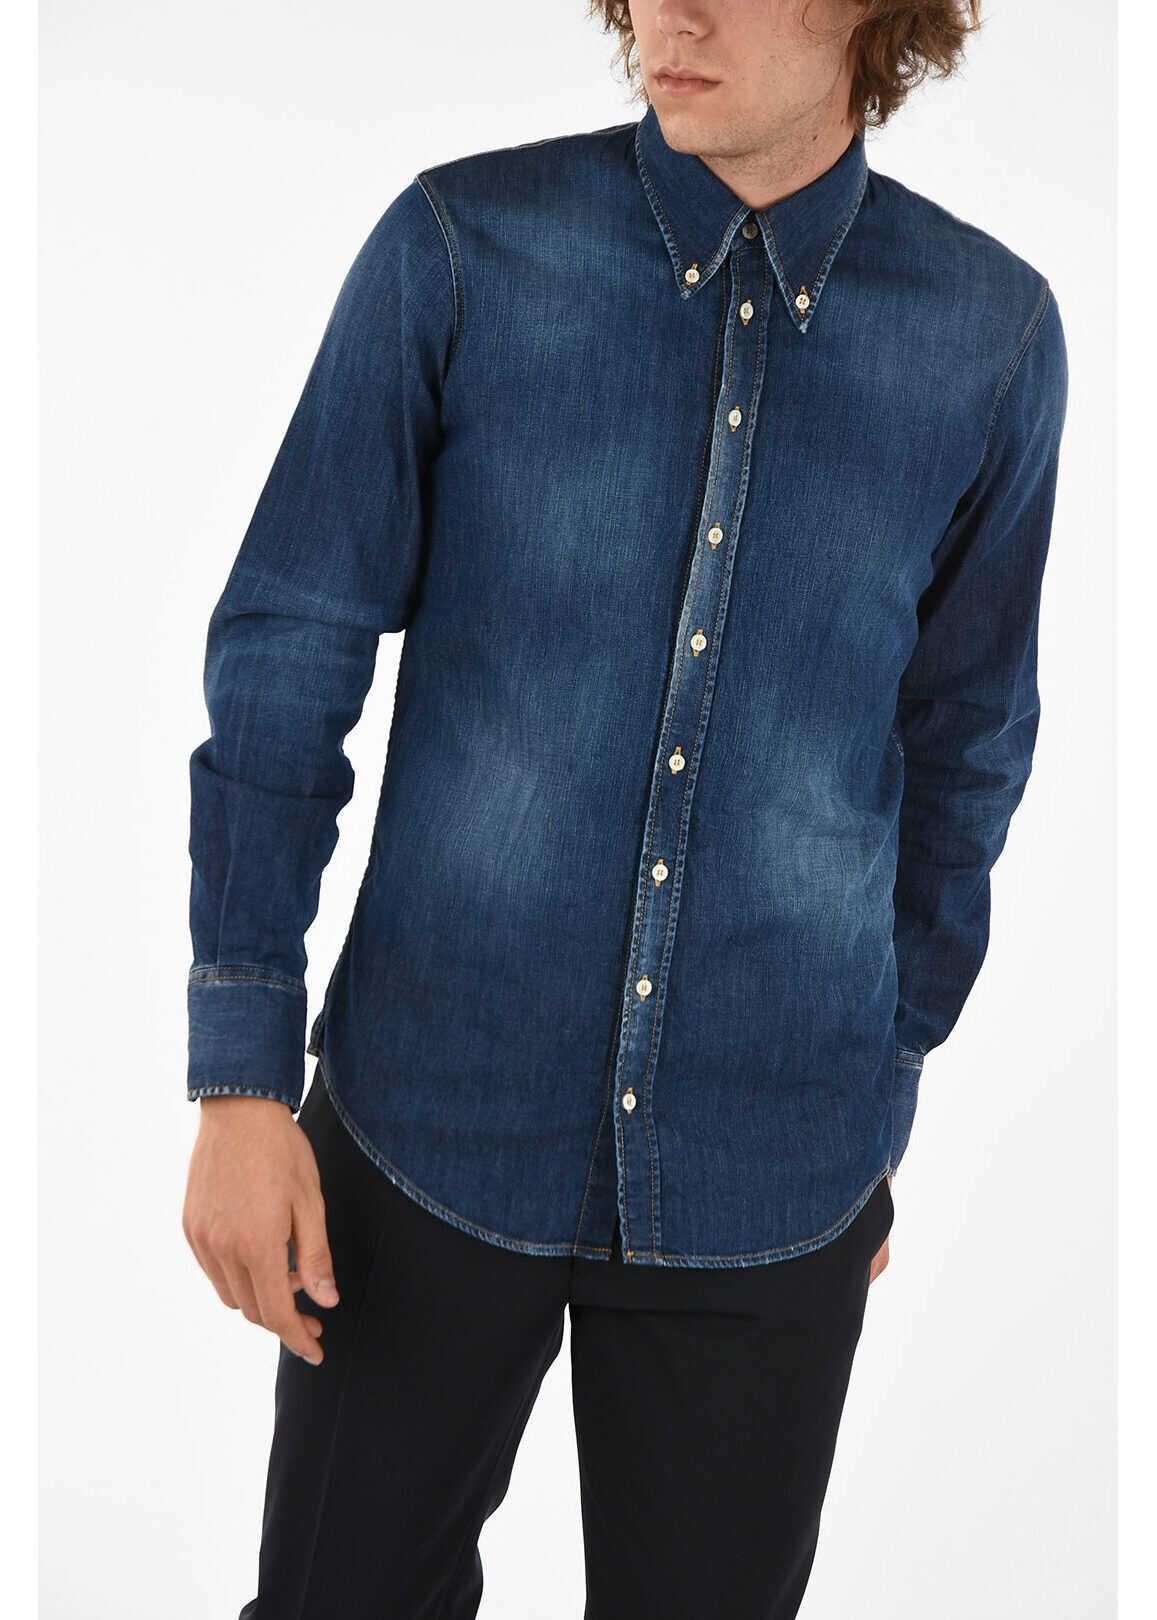 DSQUARED2 Stonewashed Button-Down Shirt BLUE imagine